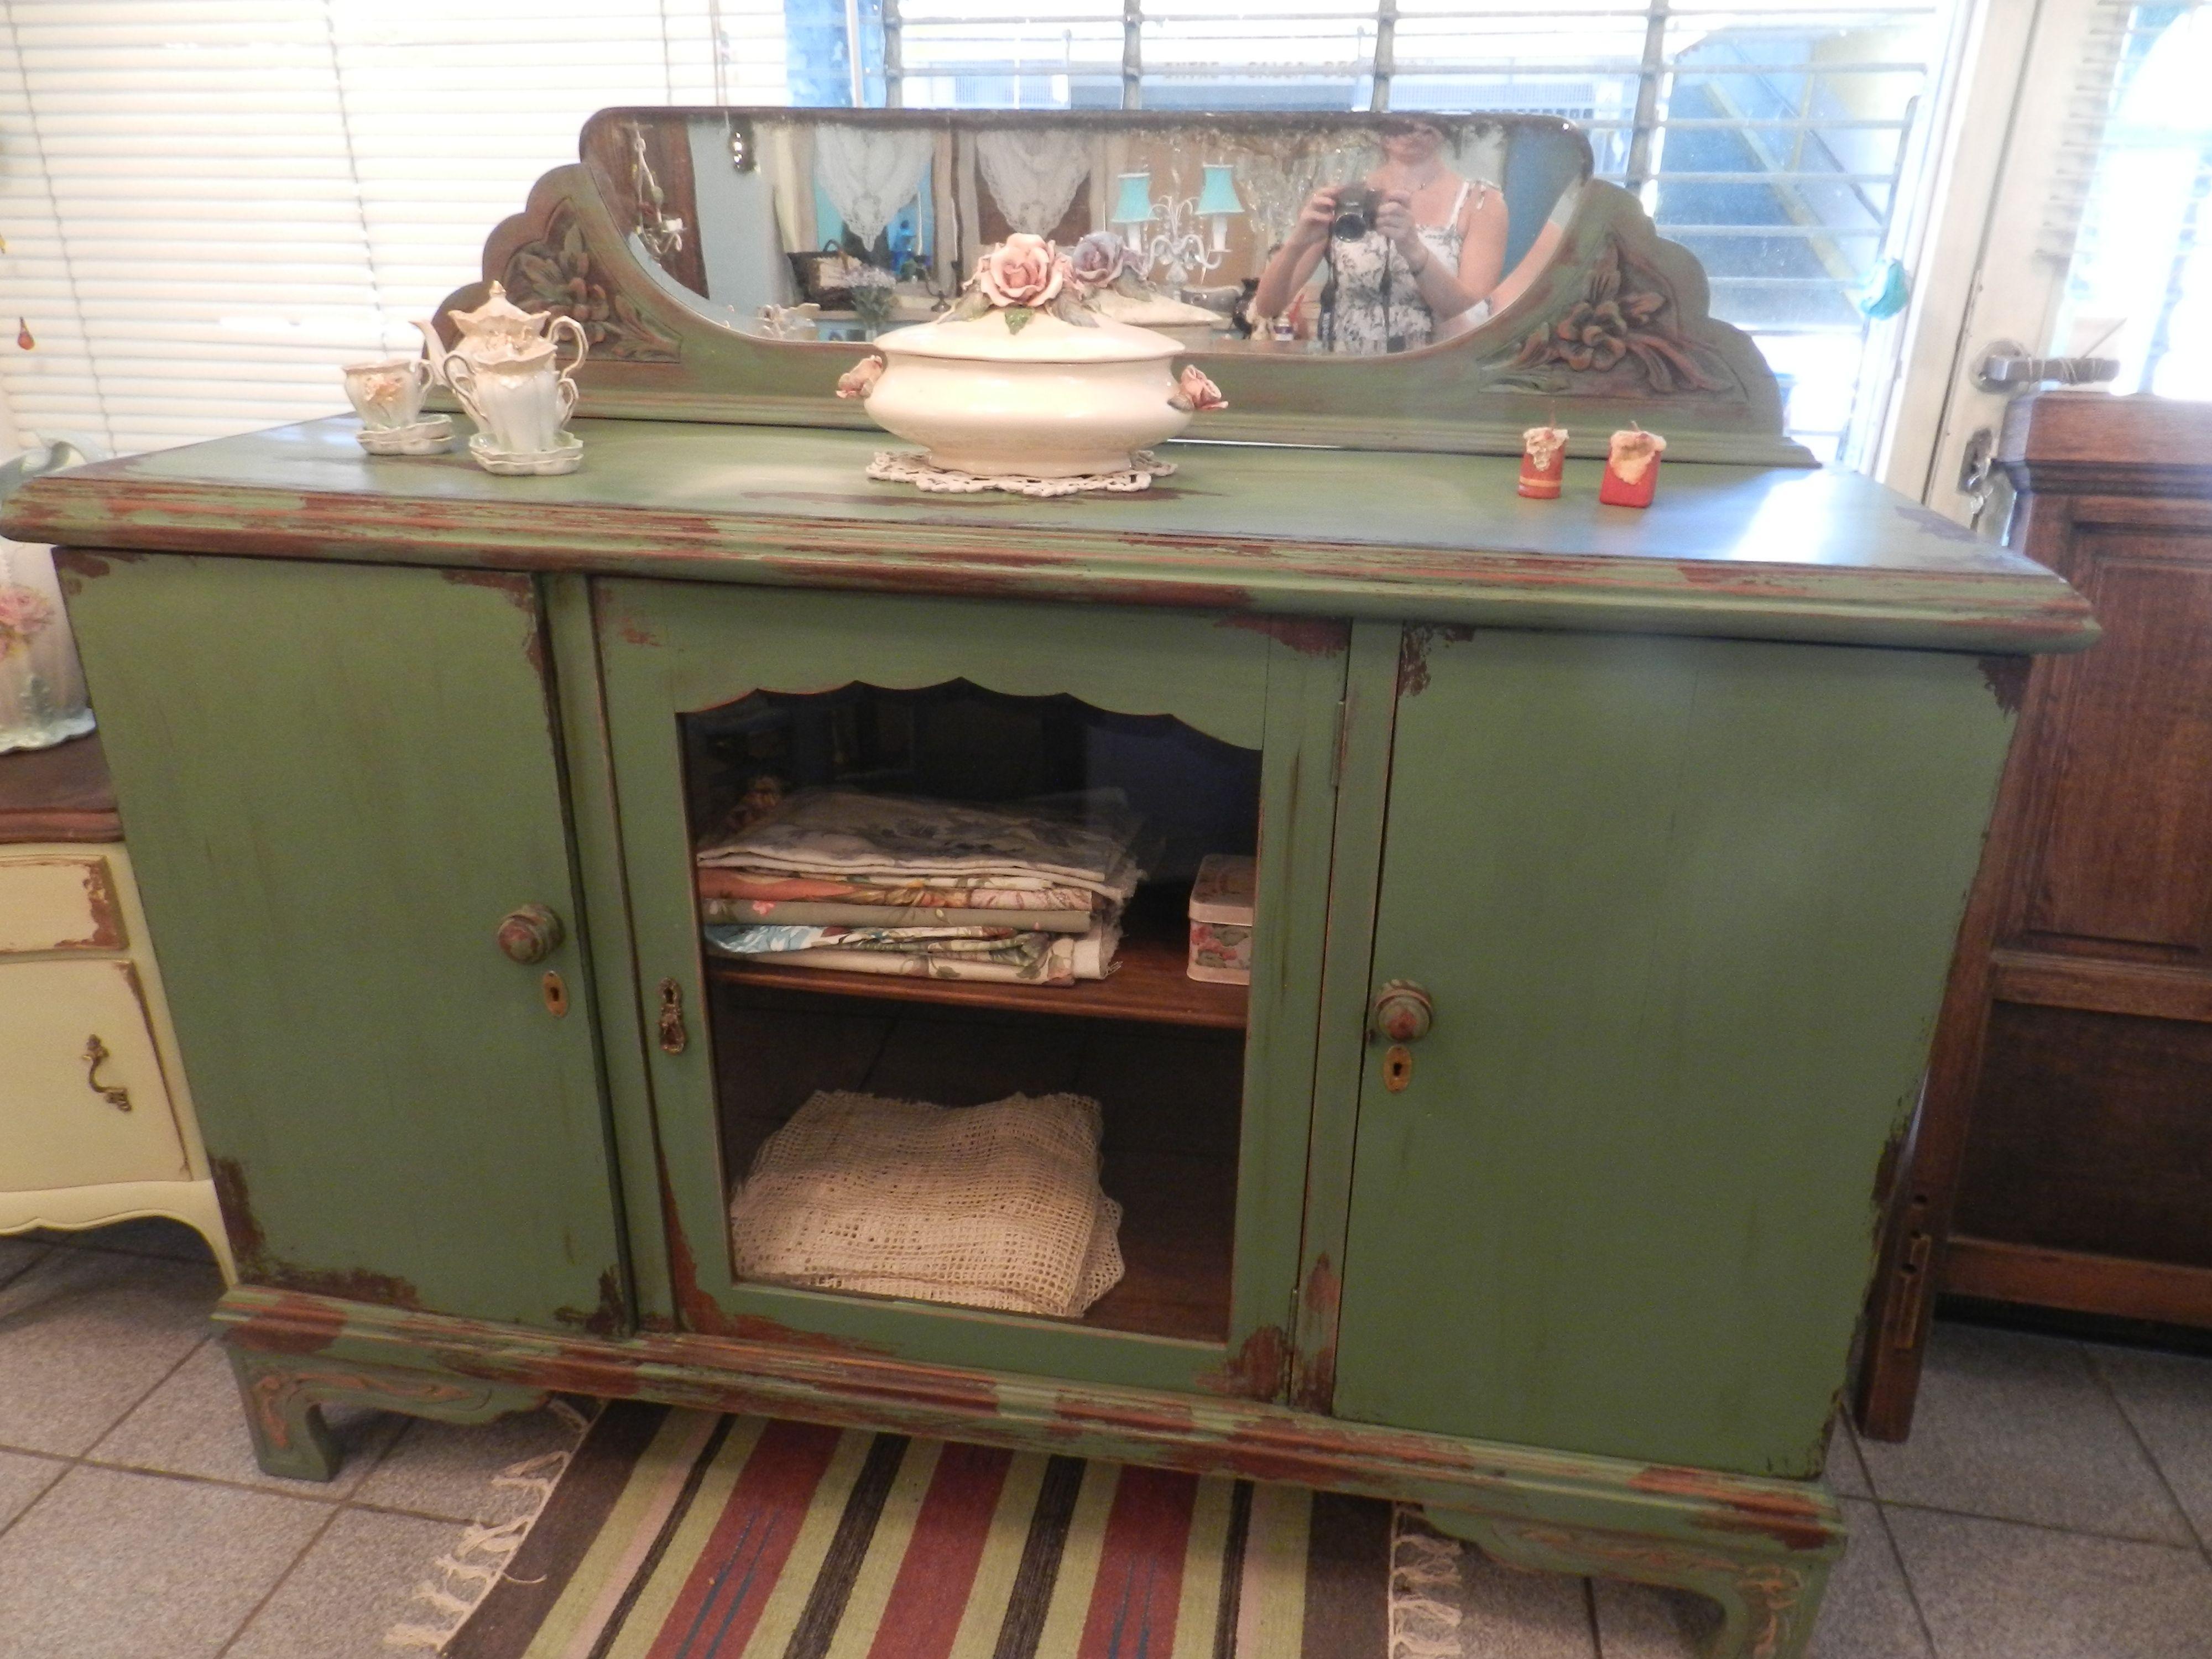 Mueble art deco decapado decap pinterest muebles - Mueble art deco ...